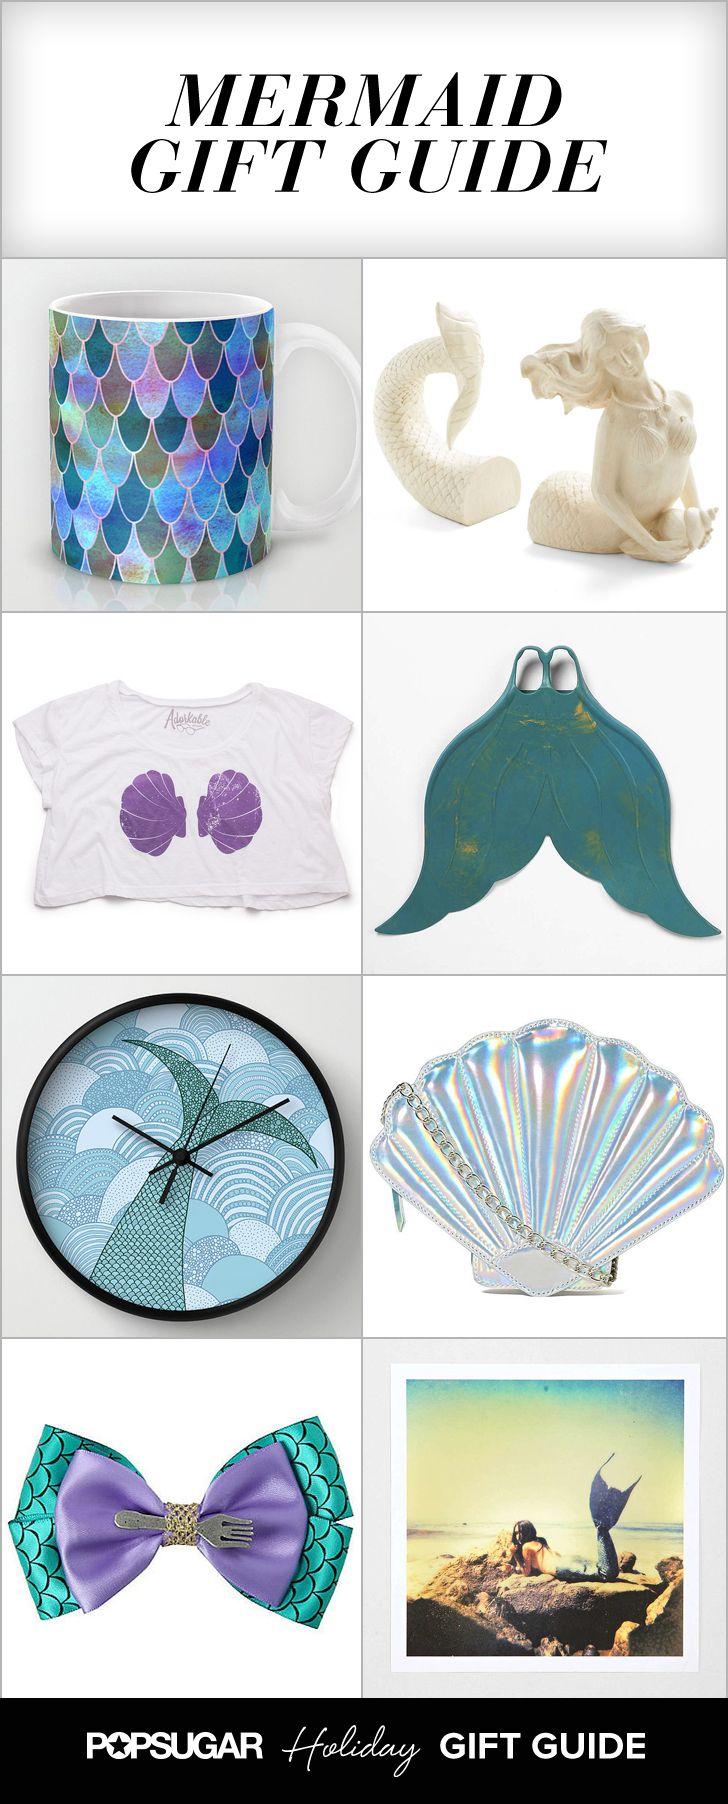 Best 25+ Mermaid gifts ideas on Pinterest | Do mermaids exist ...